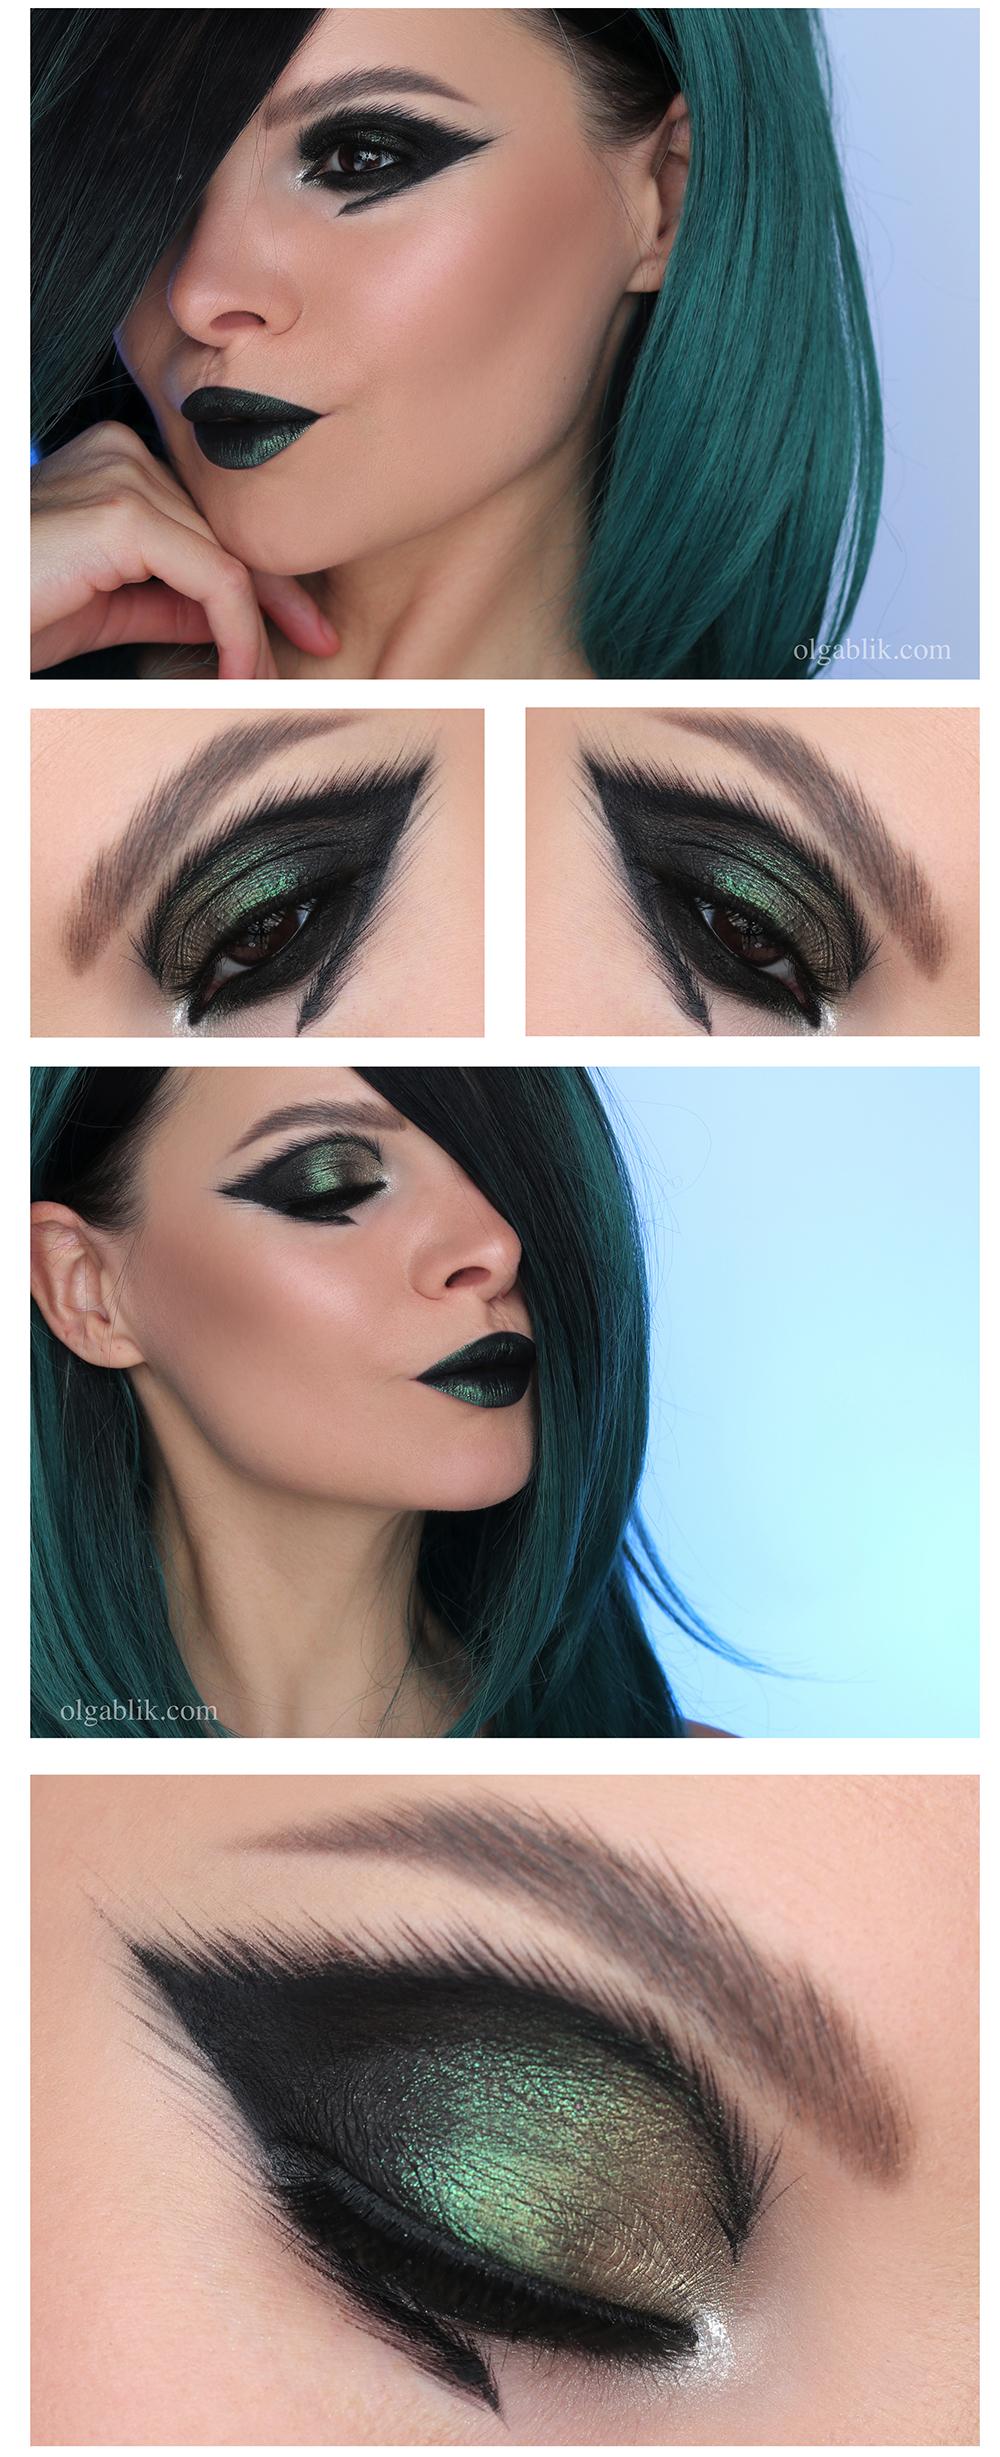 Фантазийный макияж, Фантазийный макияж фото и образ